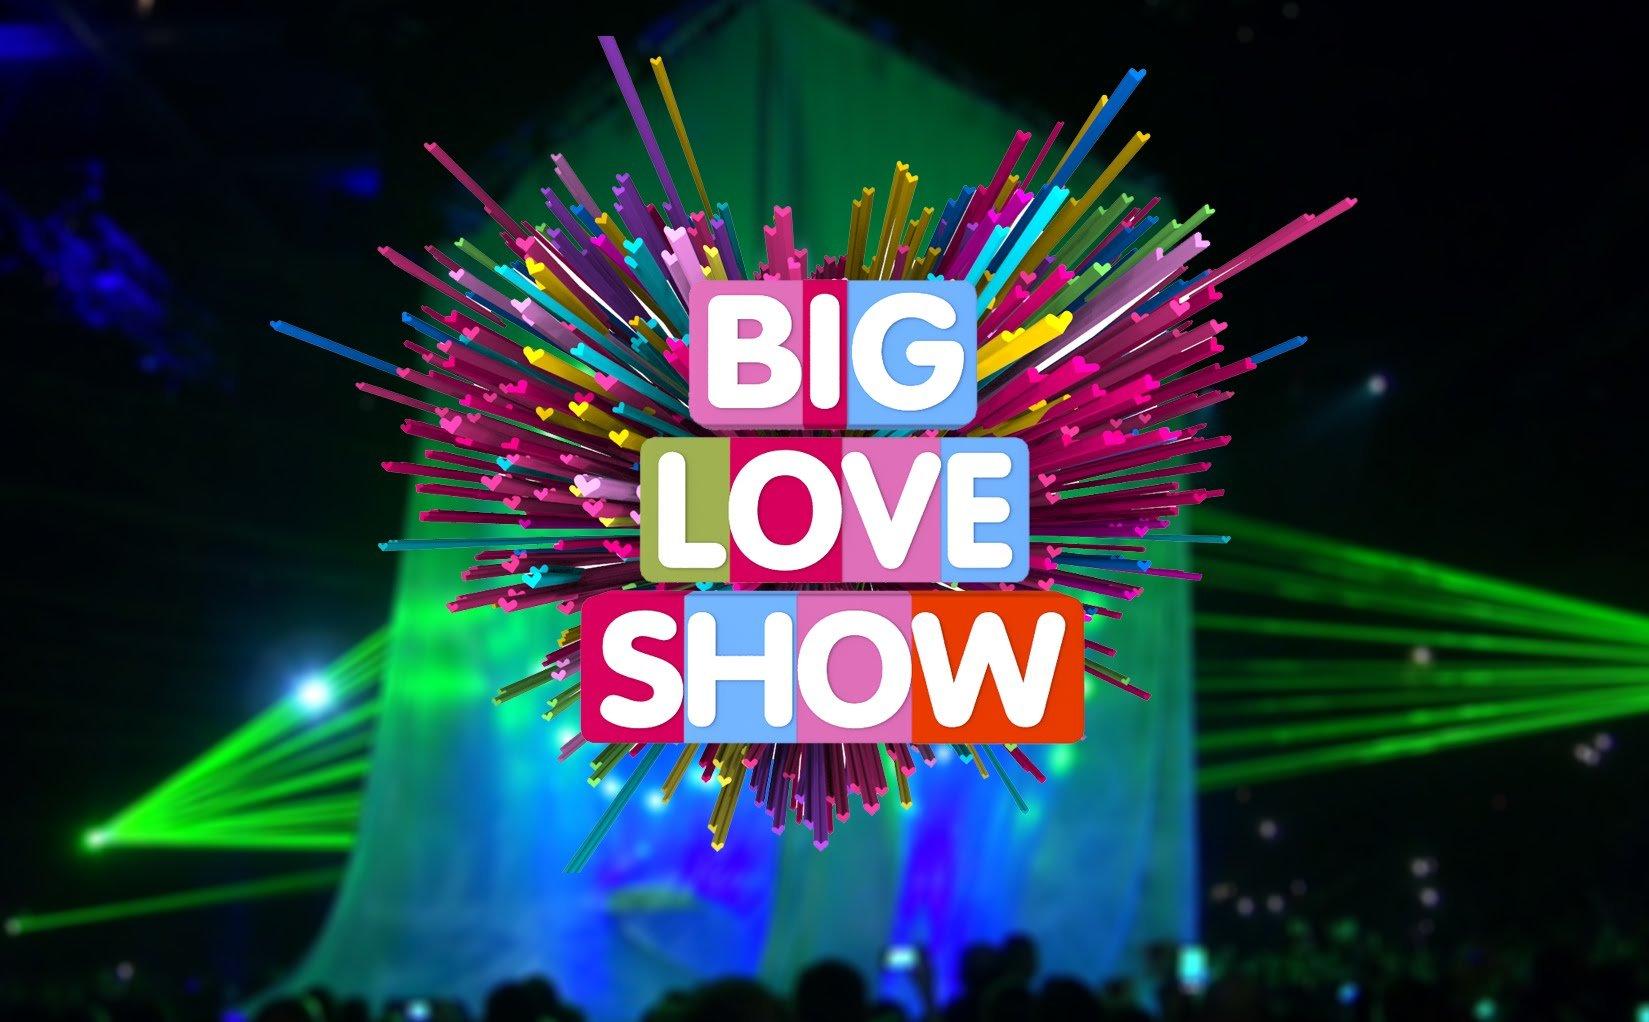 Big Love Show 2016